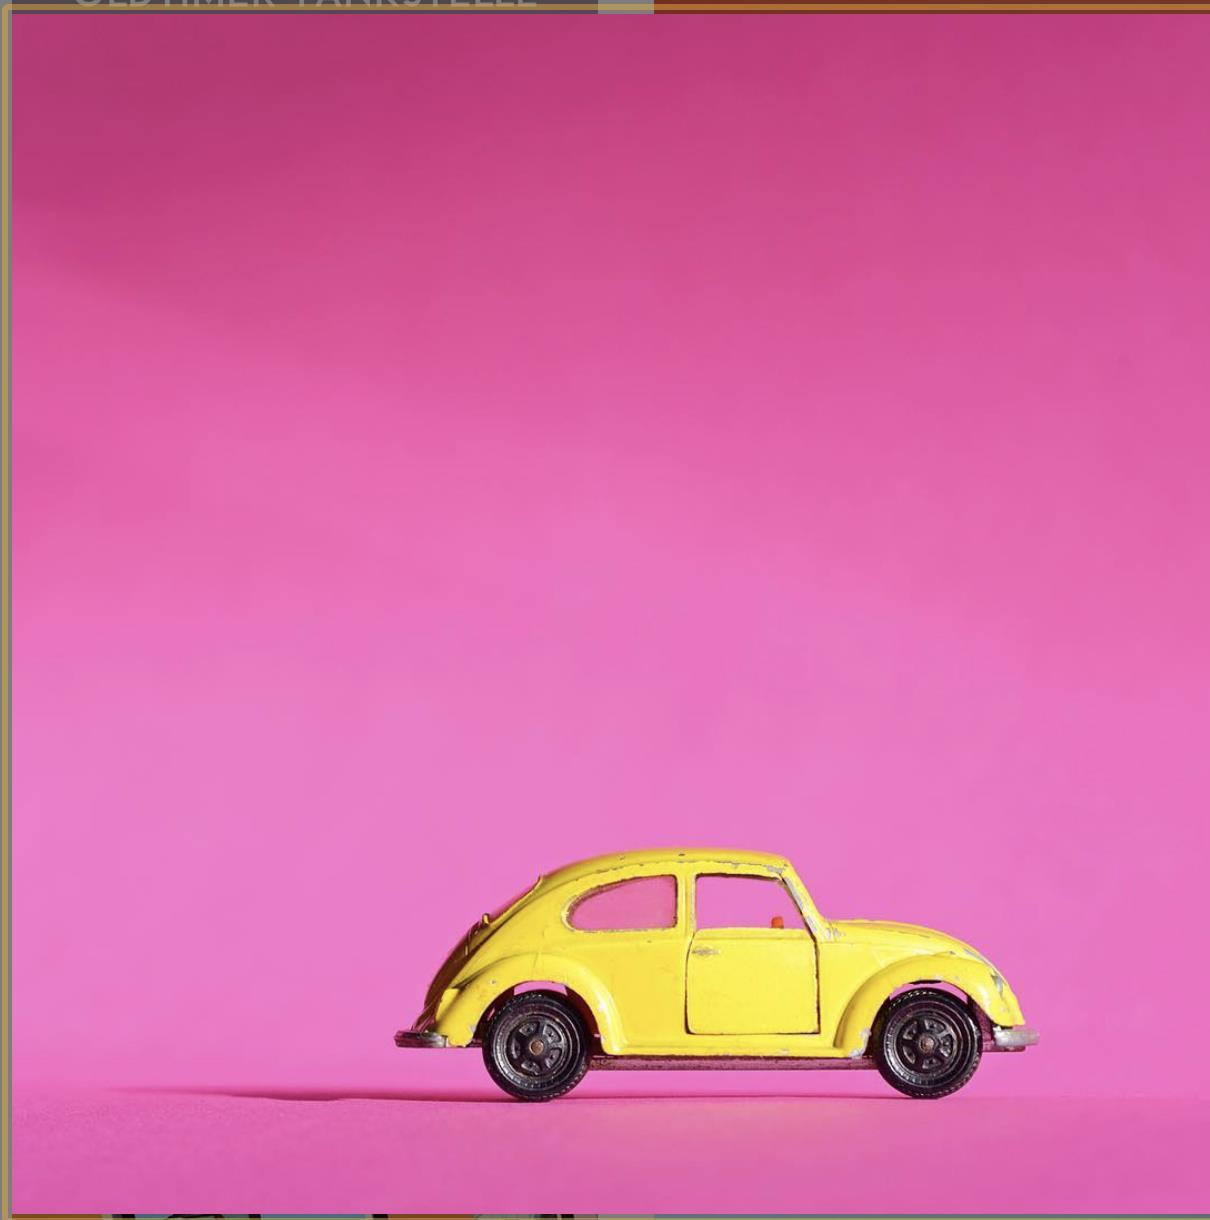 Candycars: Sunny bug - Gieselberg, Eva - k-2107EG3